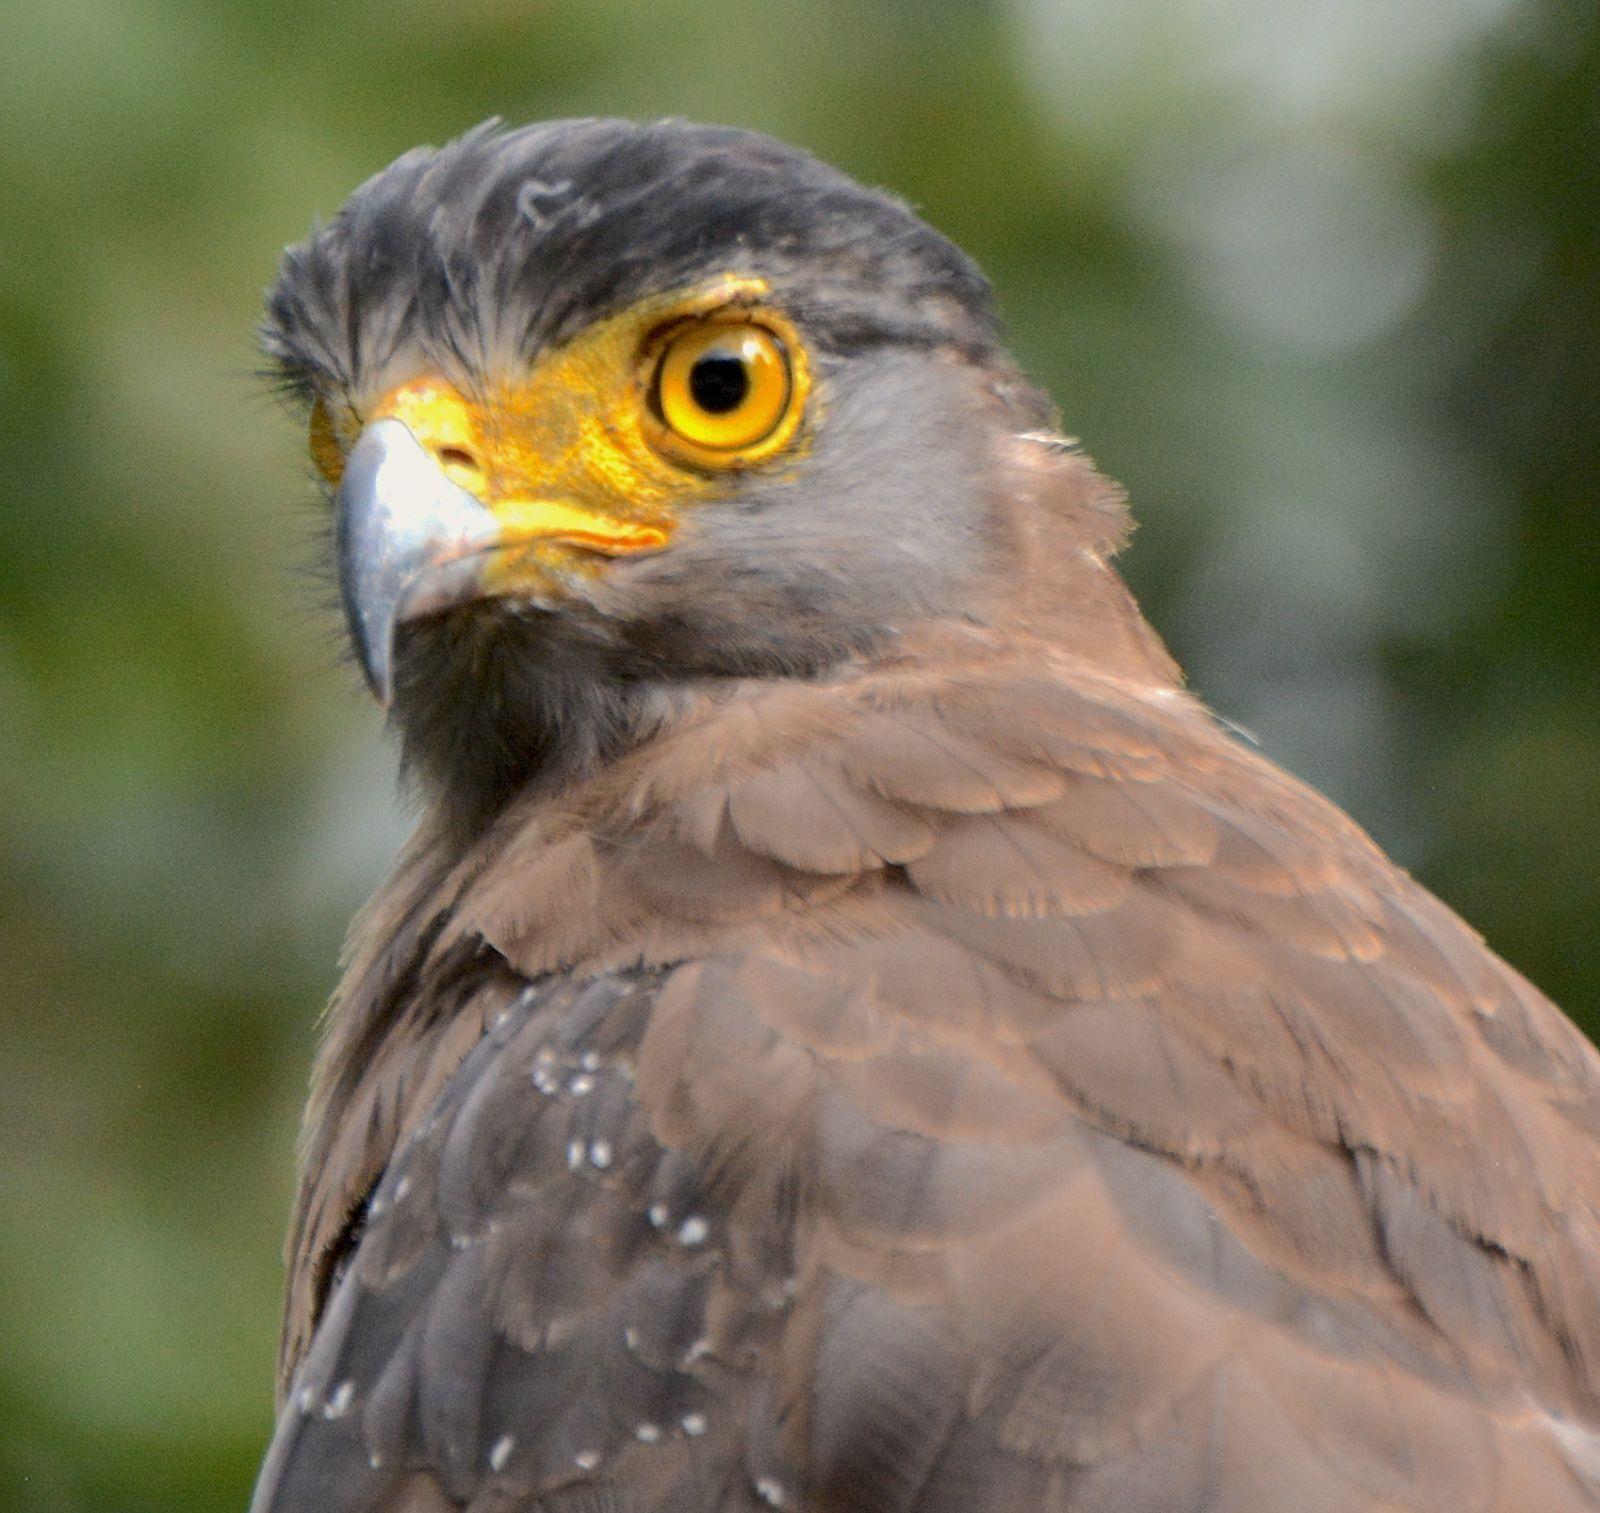 crested-serpent-eagle-one-eye-nagarahole-national-park